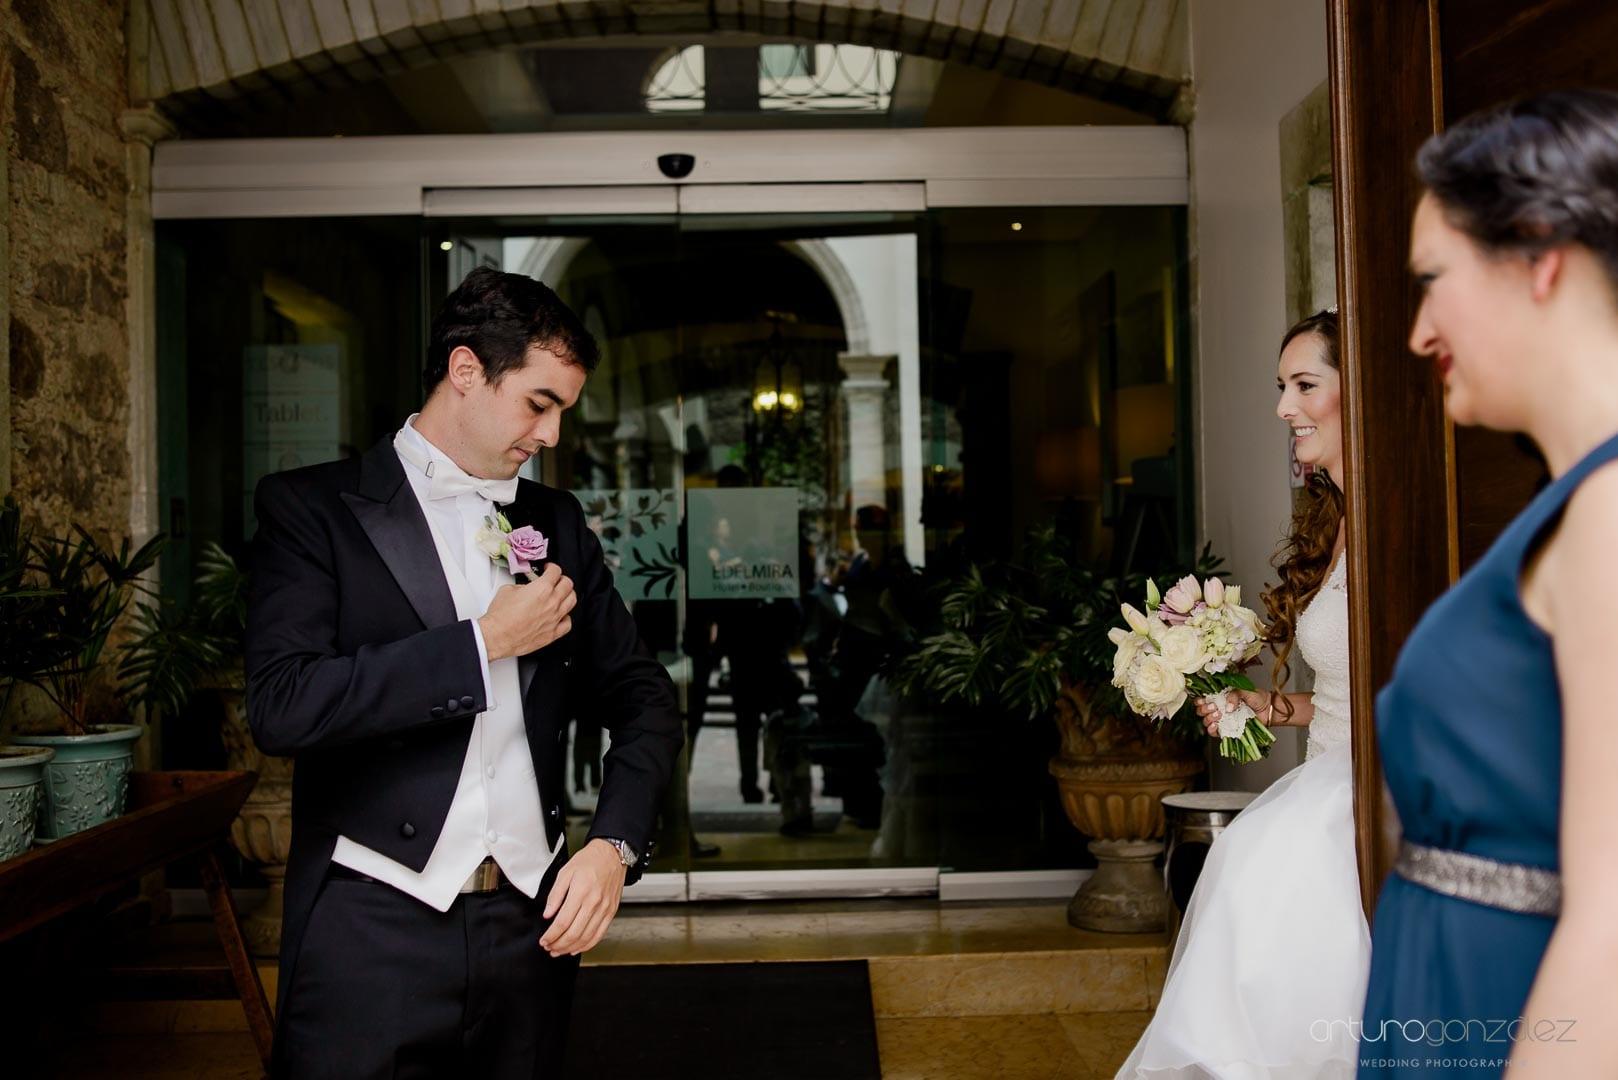 fotografo-de-bodas-en-guanajuato-25